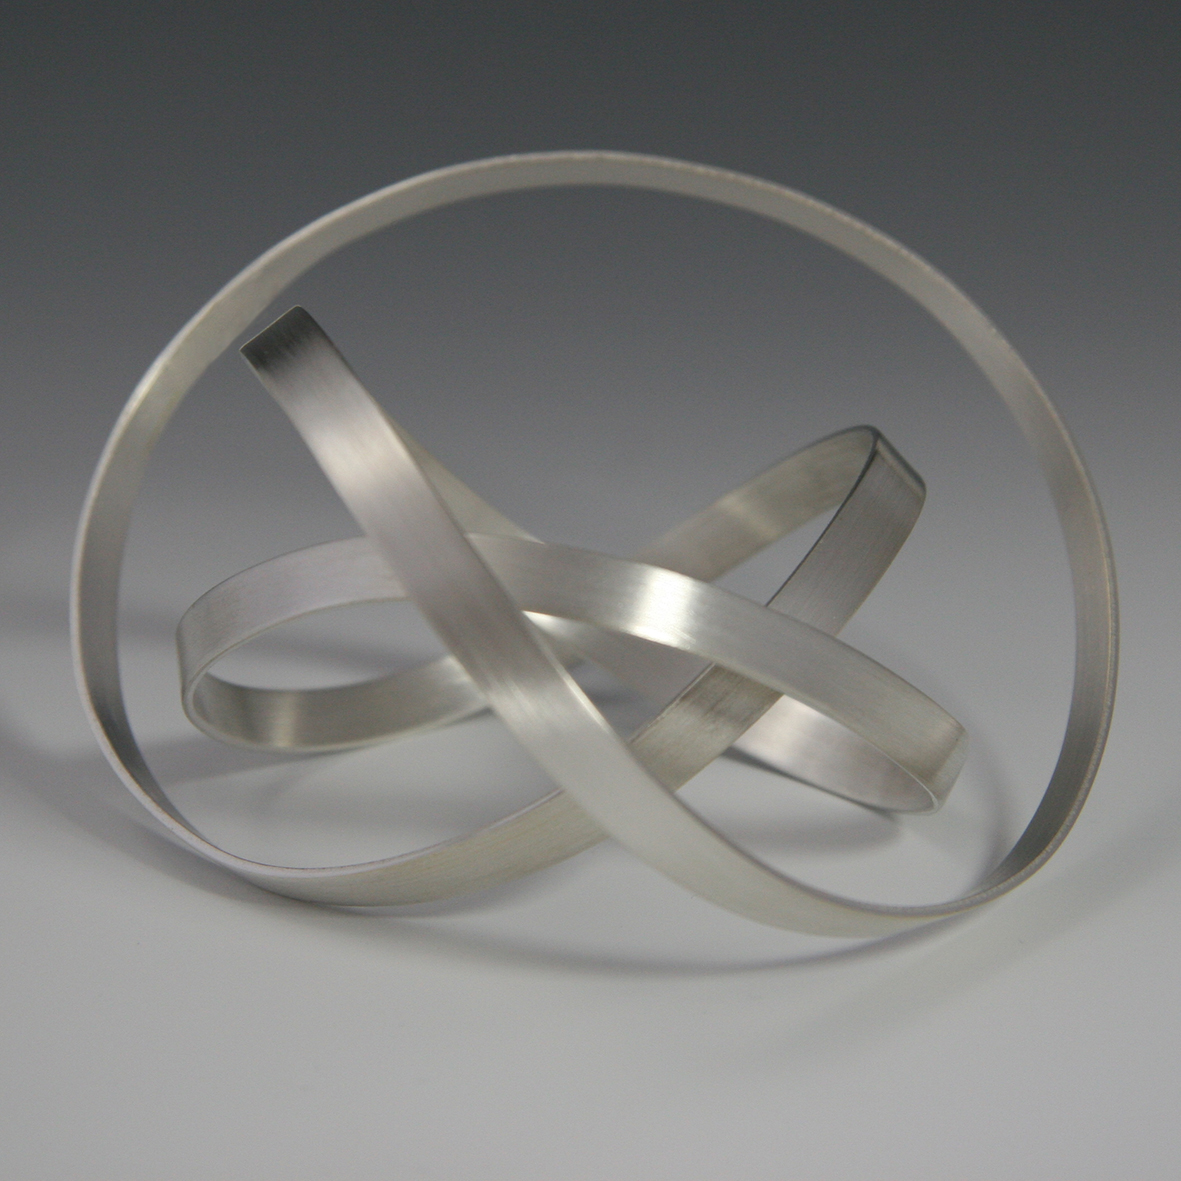 5a silver bangle.jpg